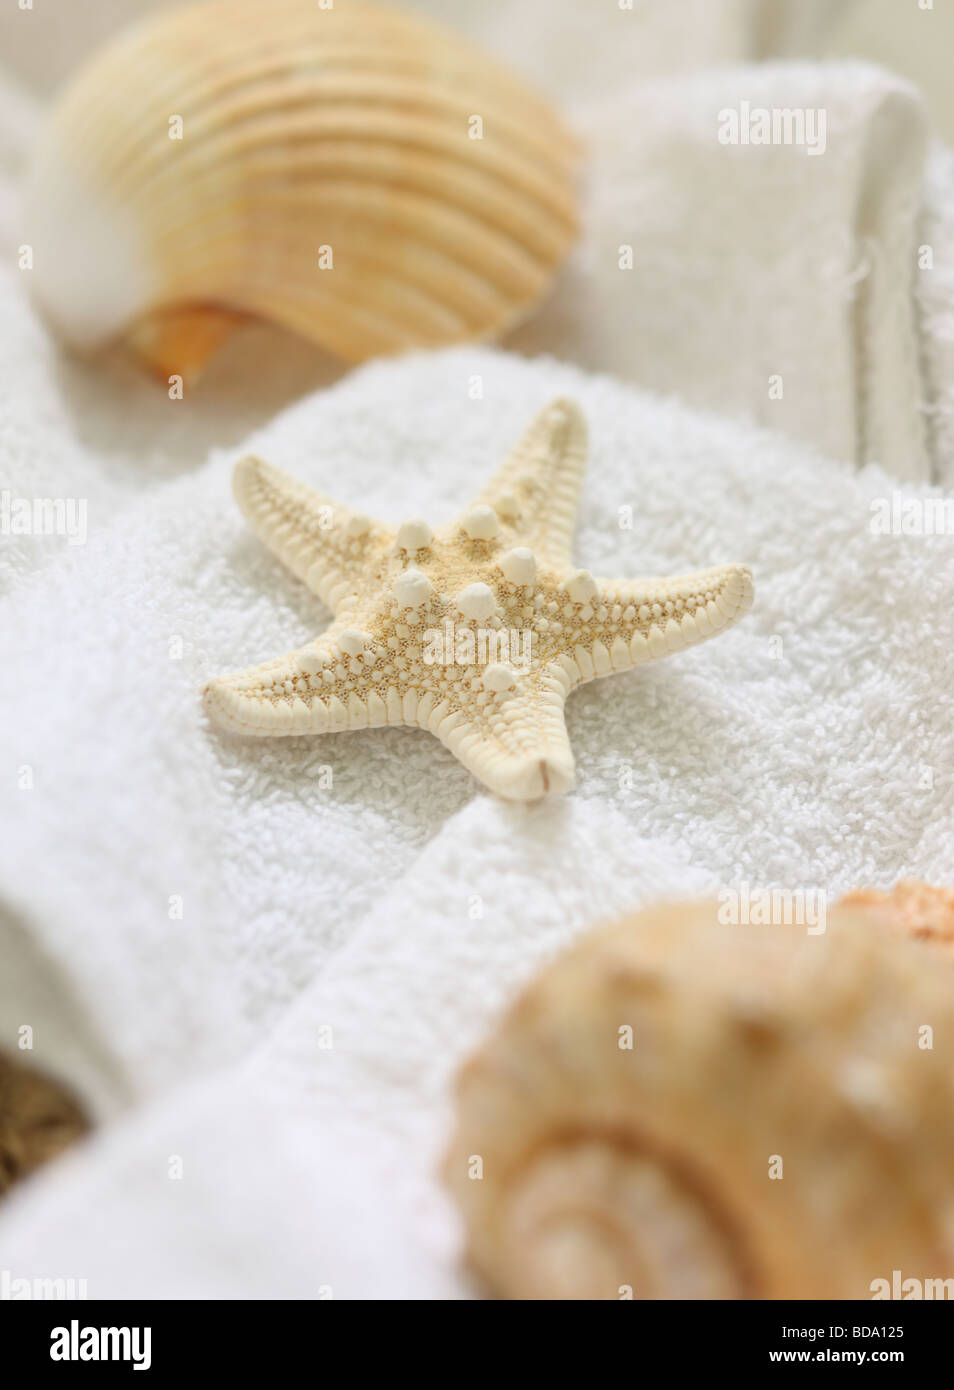 Starfish and shells on washcloths - Stock Image